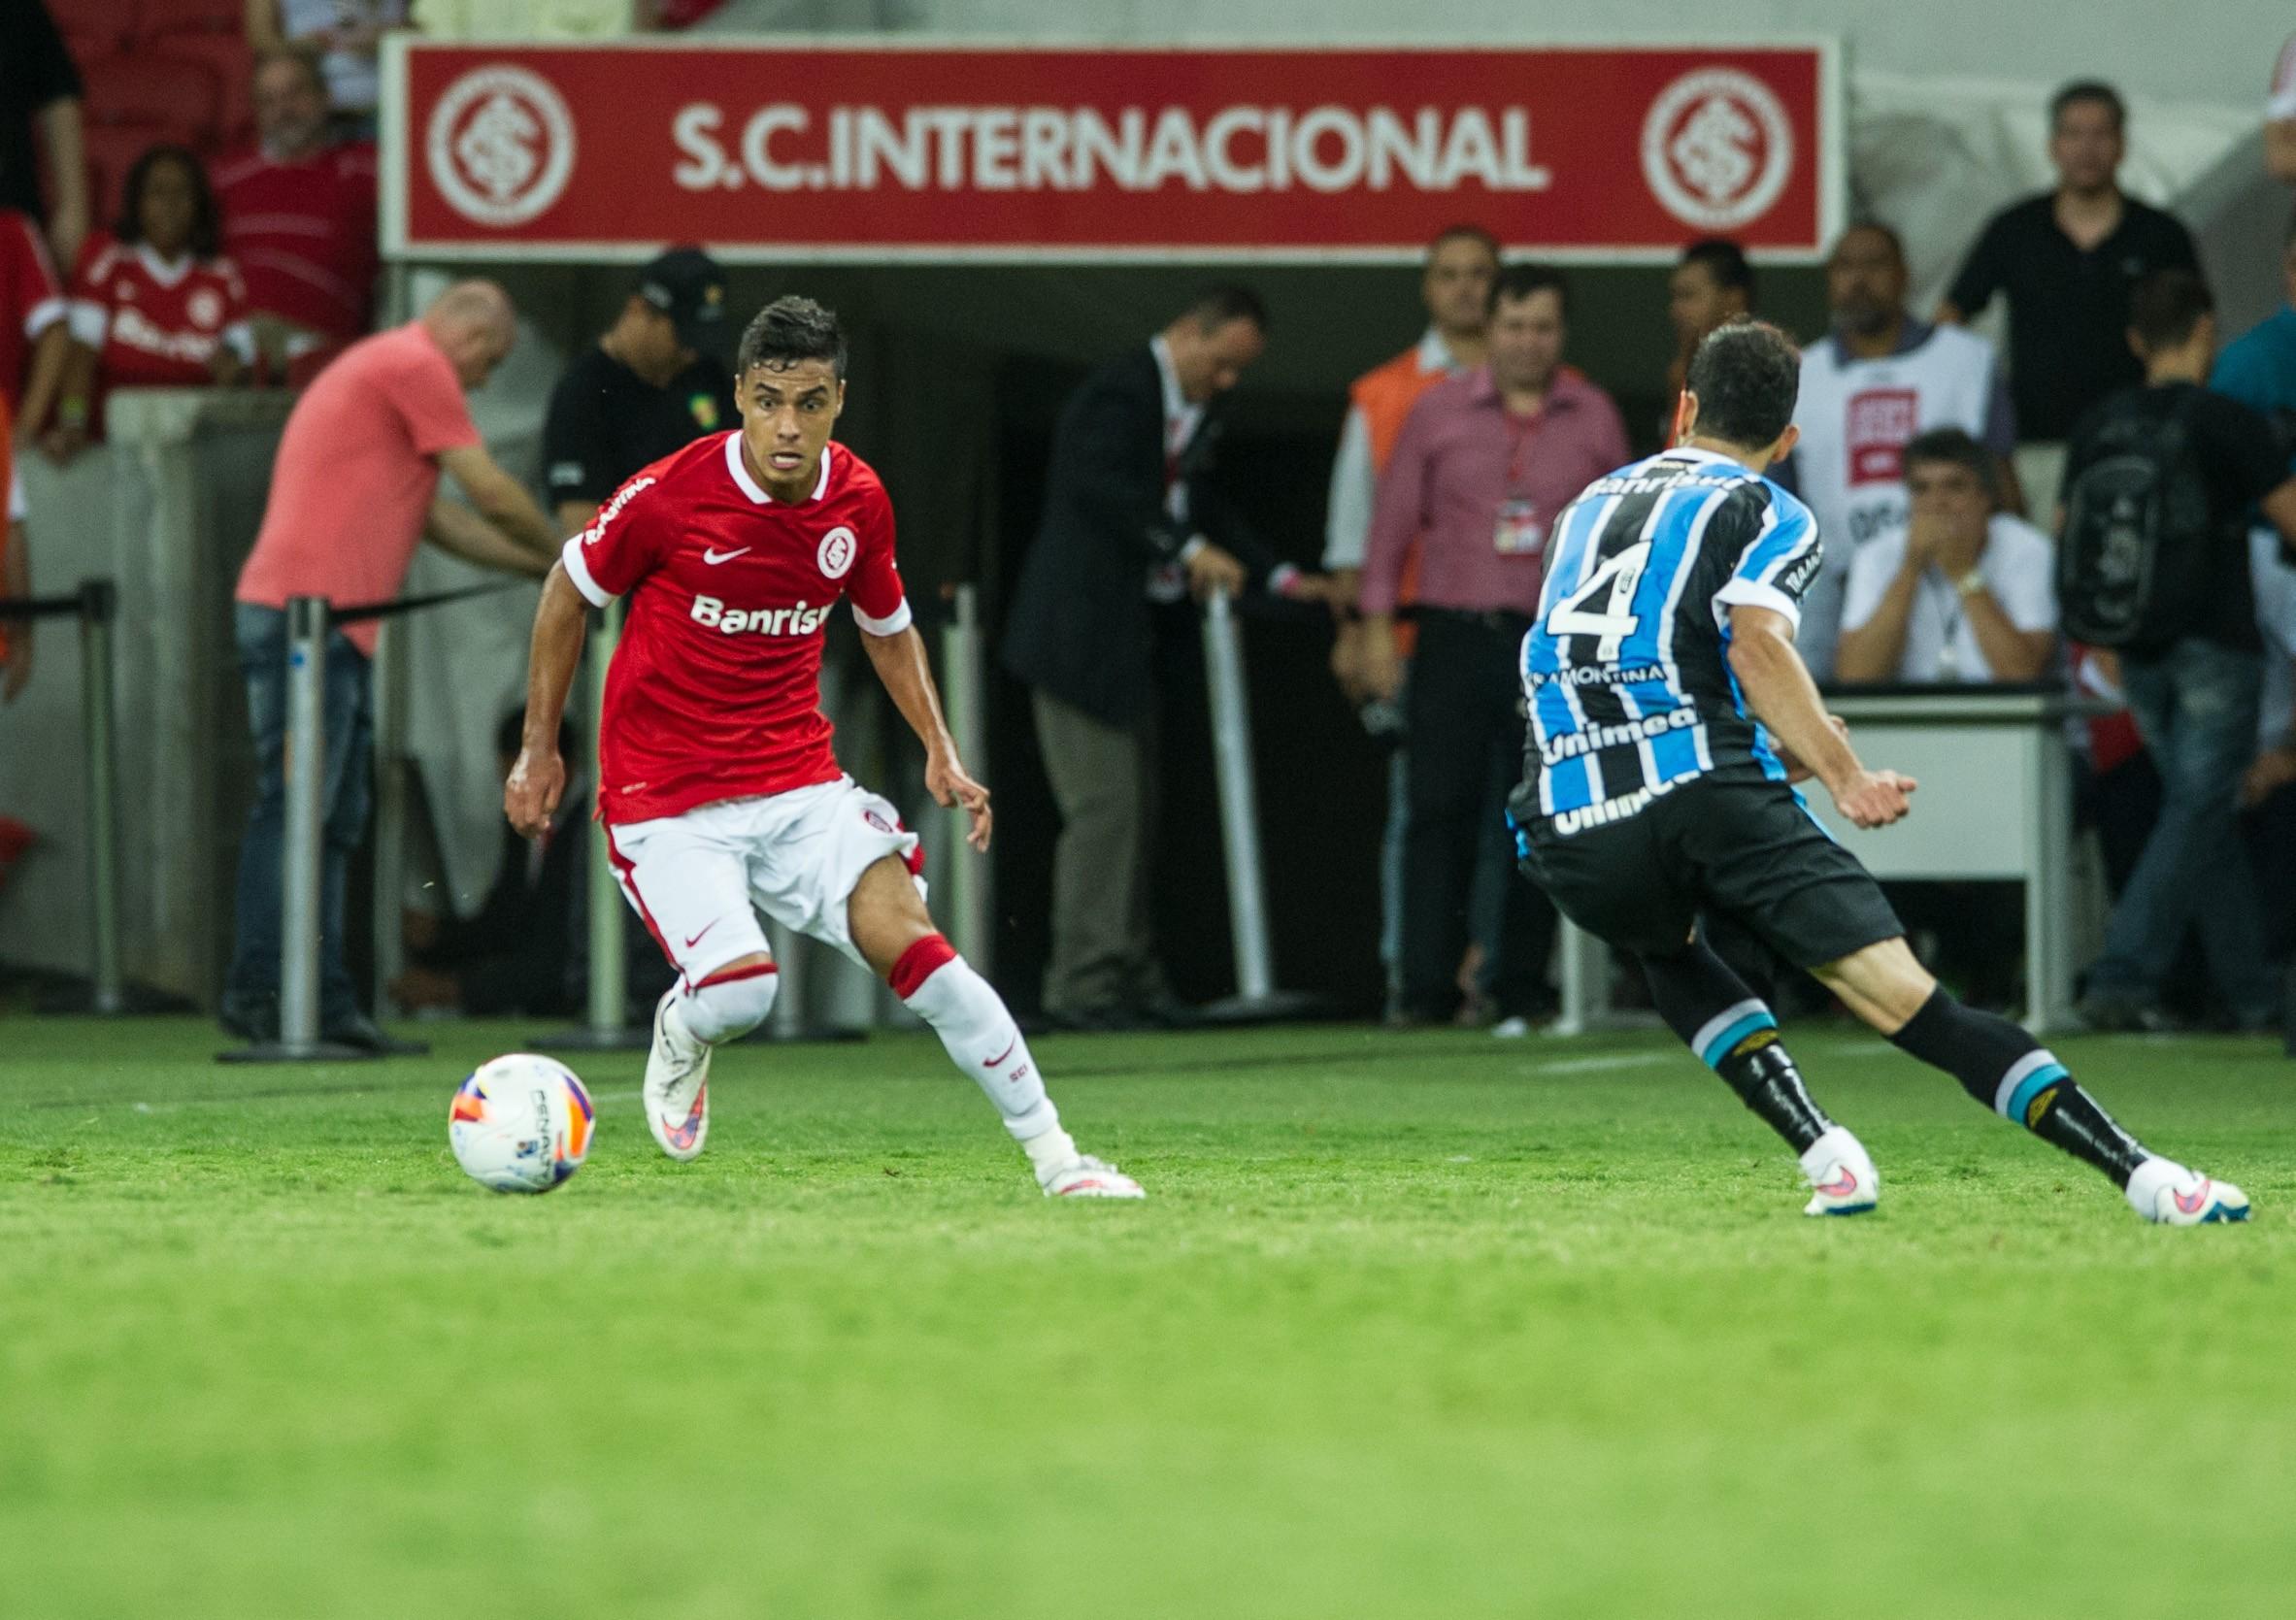 5ea67ccd7b4 http   globoesporte.globo.com futebol times cruzeiro noticia 2015 03 ...